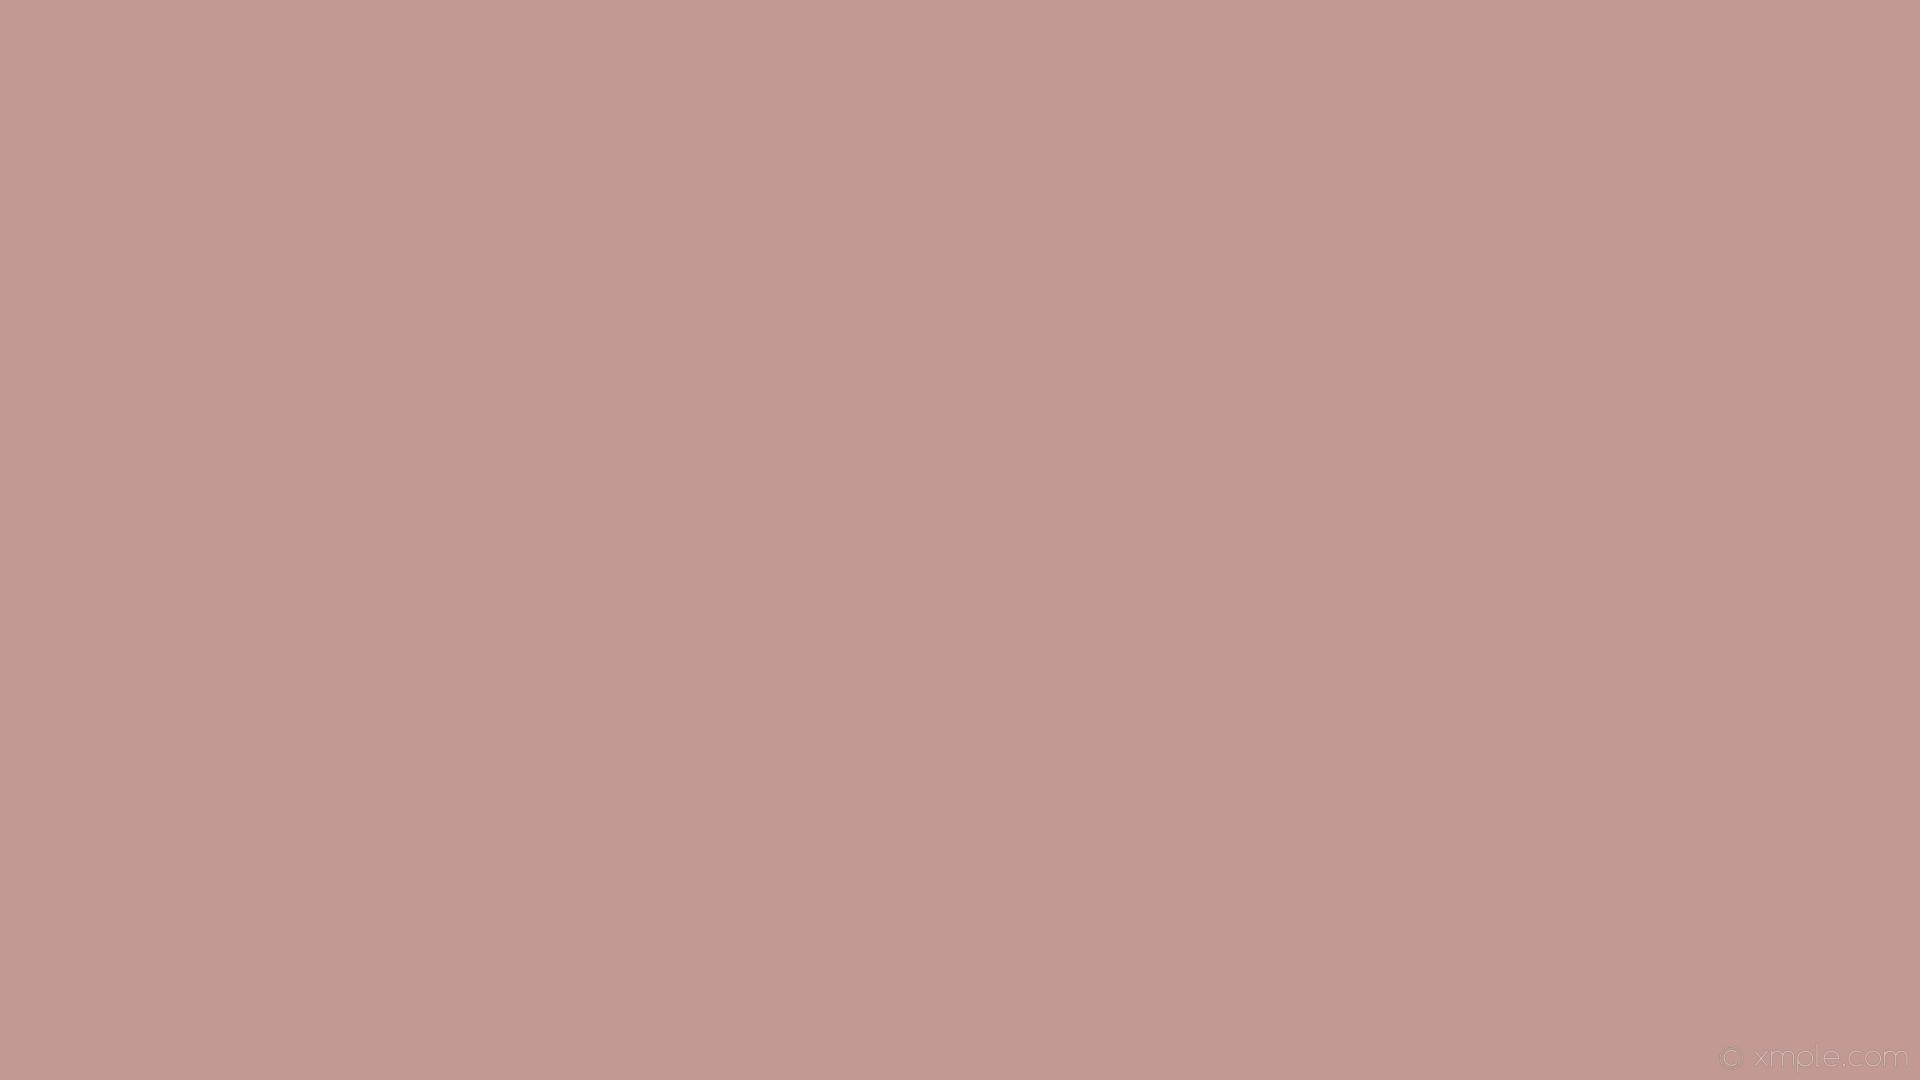 wallpaper one colour plain solid color red single #c39a93